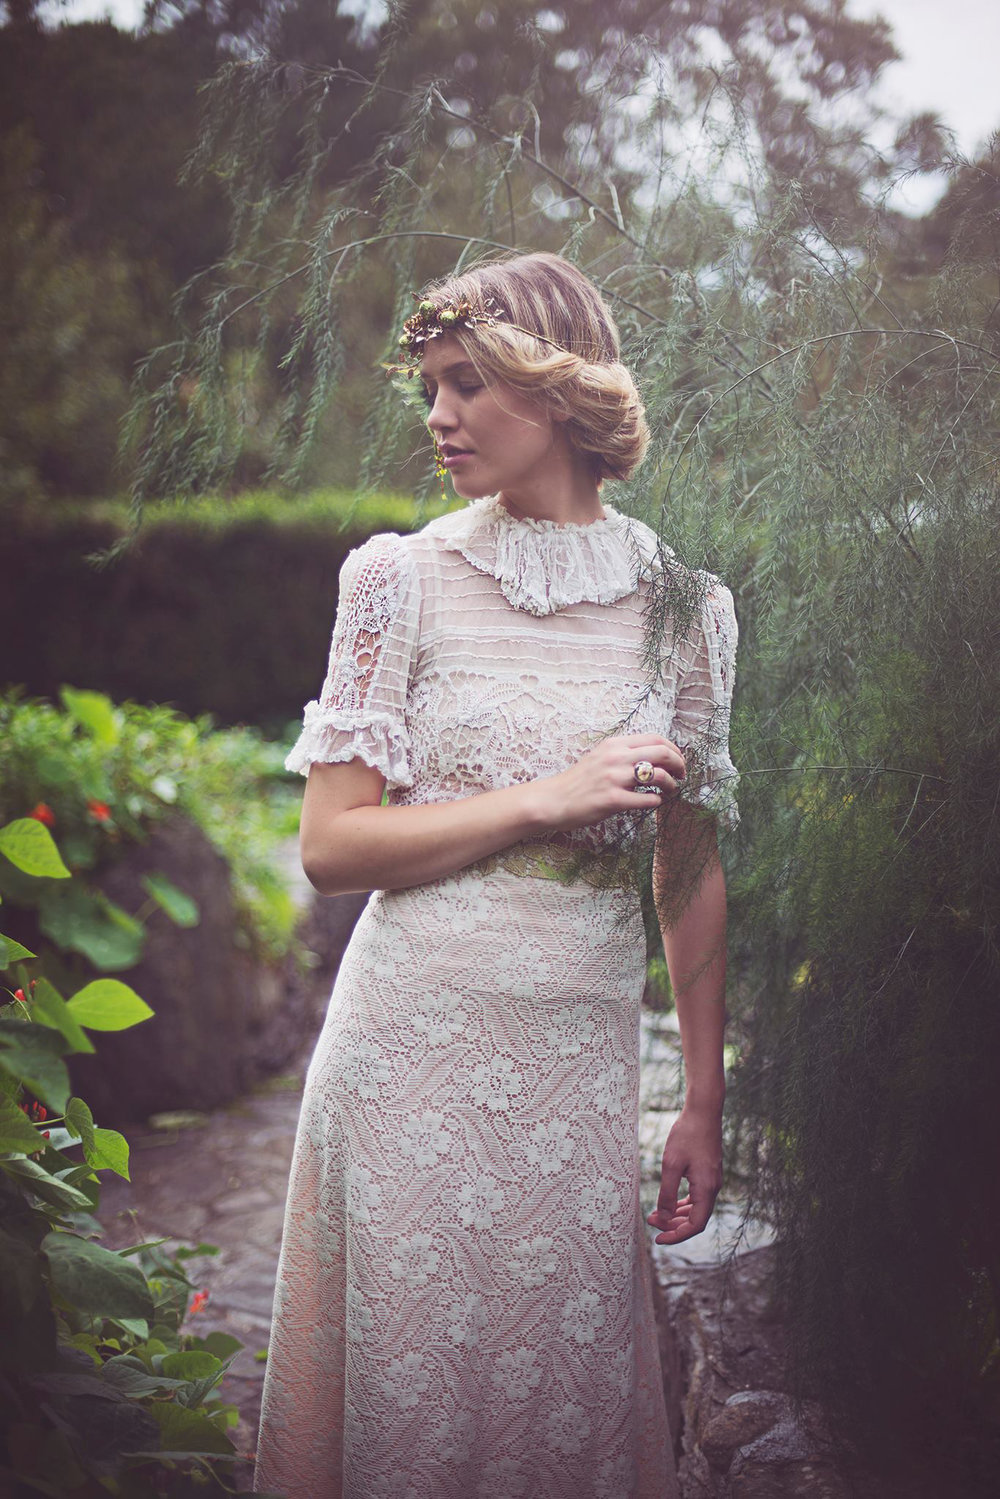 Alice Halliday - Womenswear designer